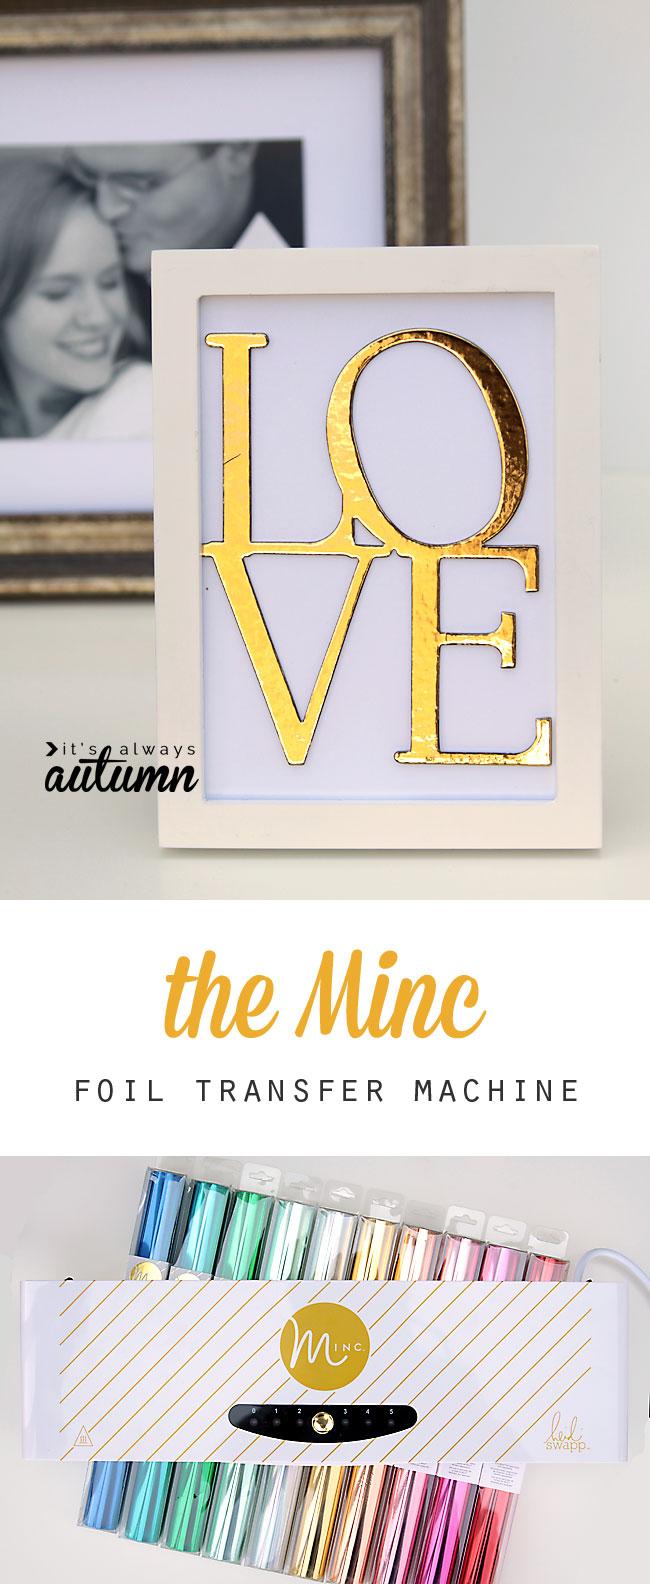 Framed word LOVE that has gold foil applied; minc foil transfer machine